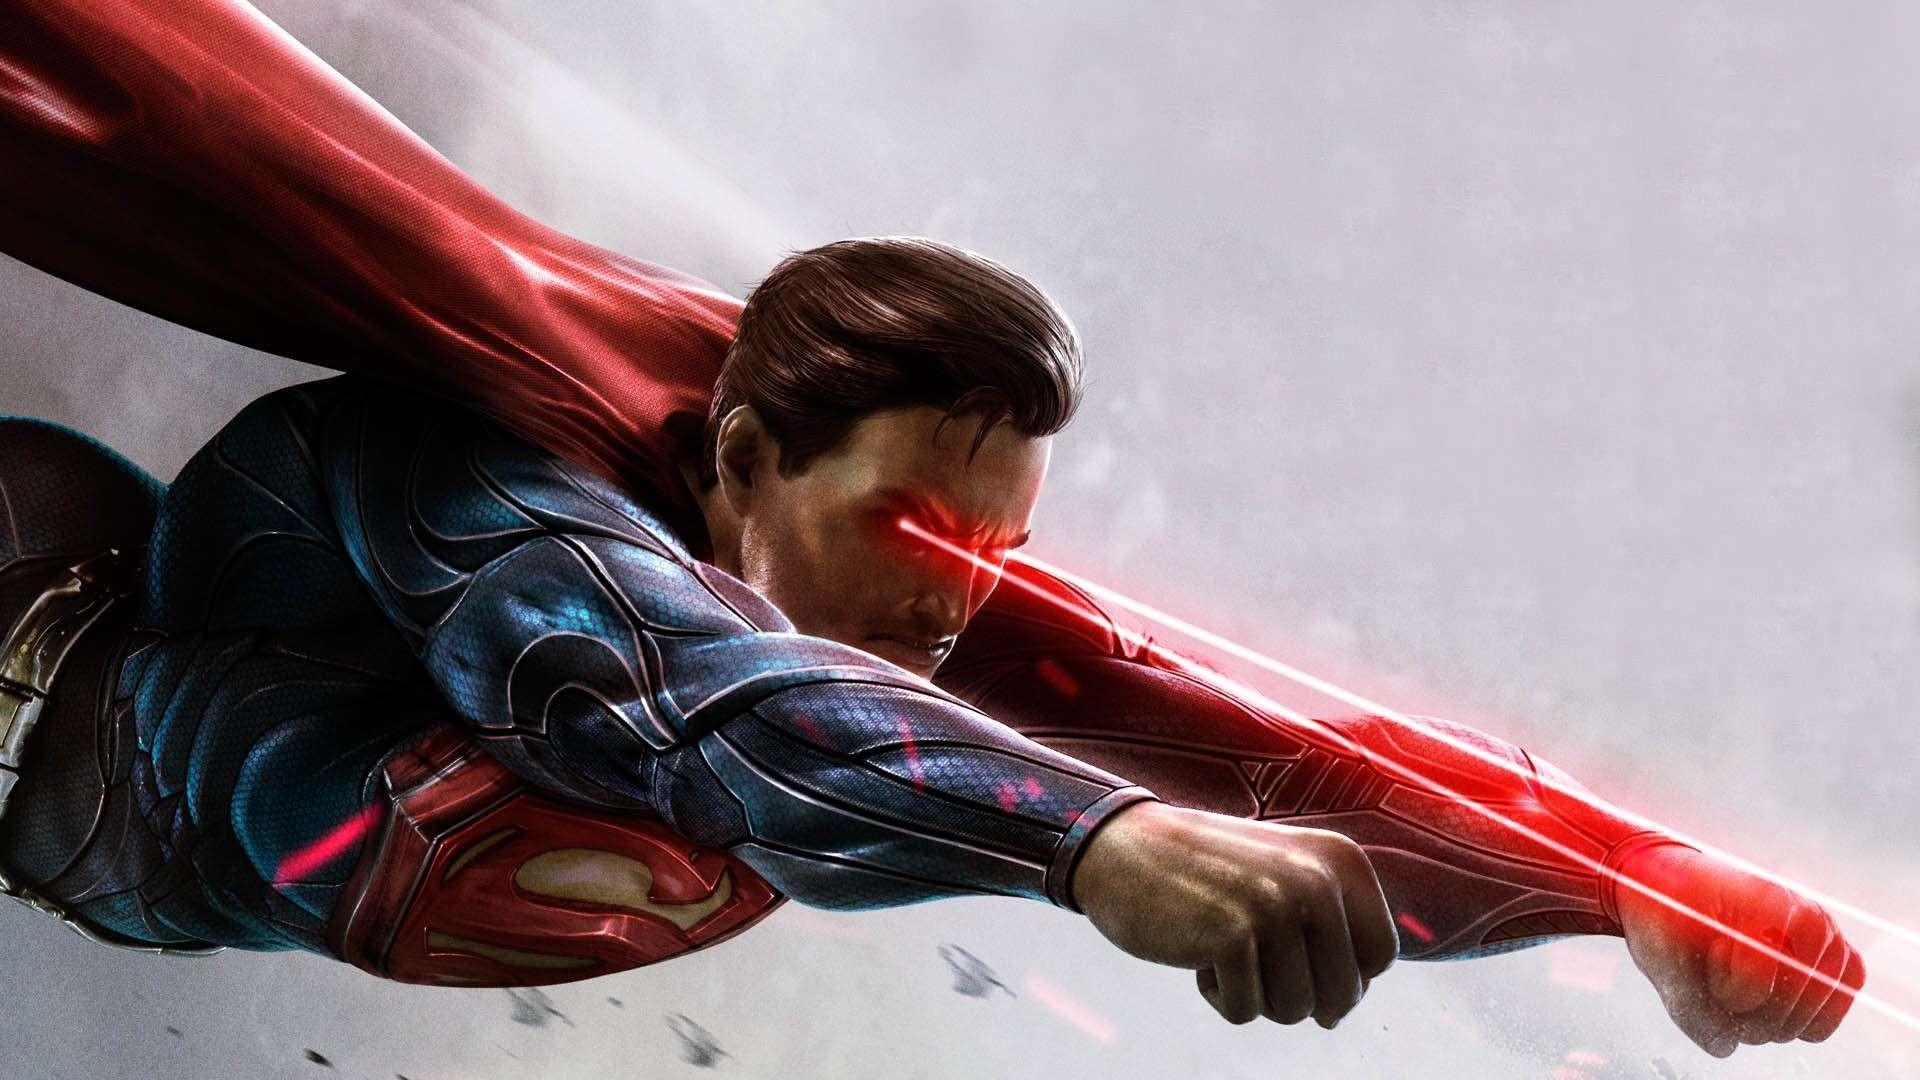 Superman Game Windows Background